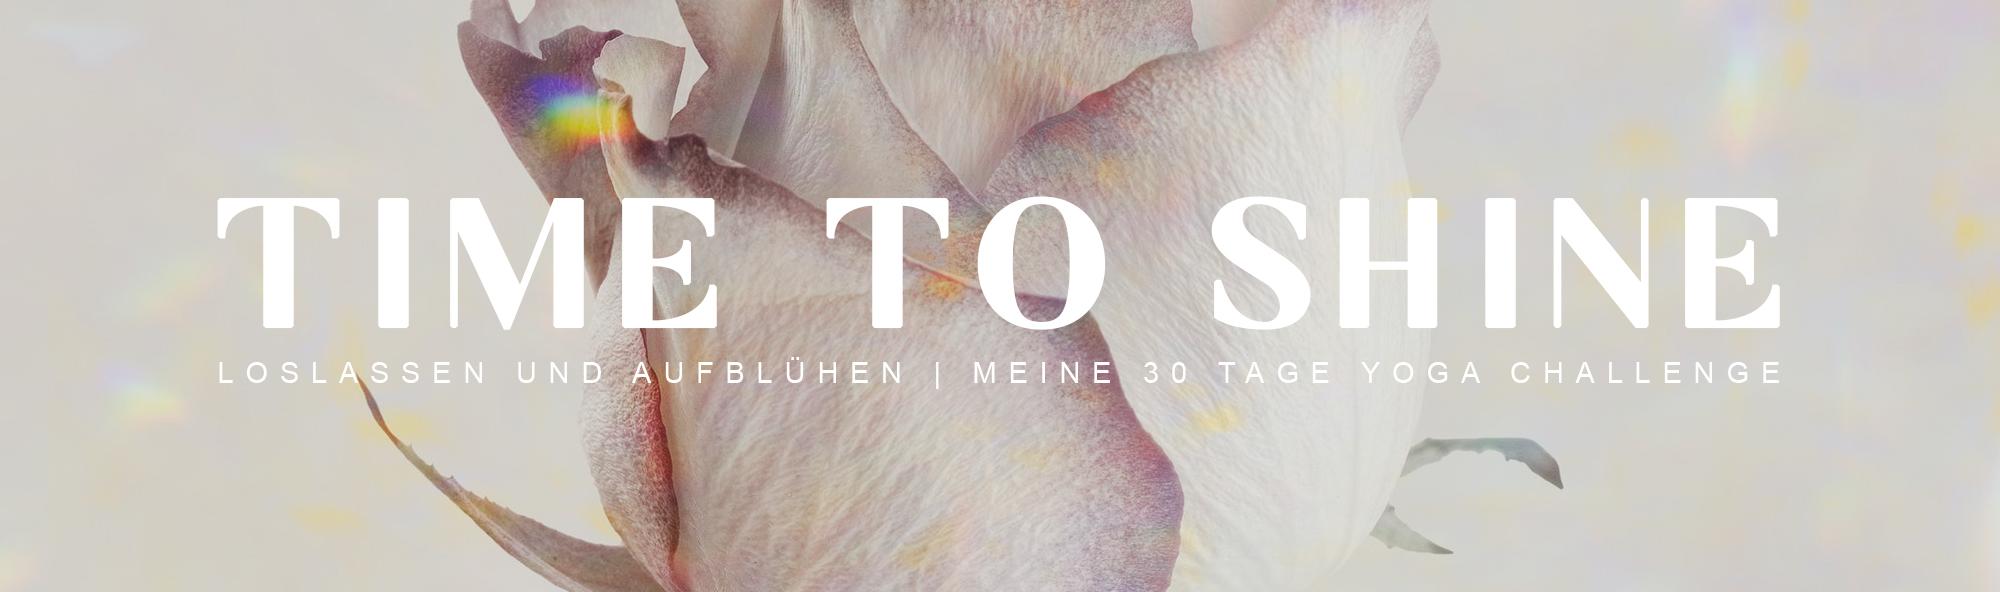 timetoshine-banner-02-2